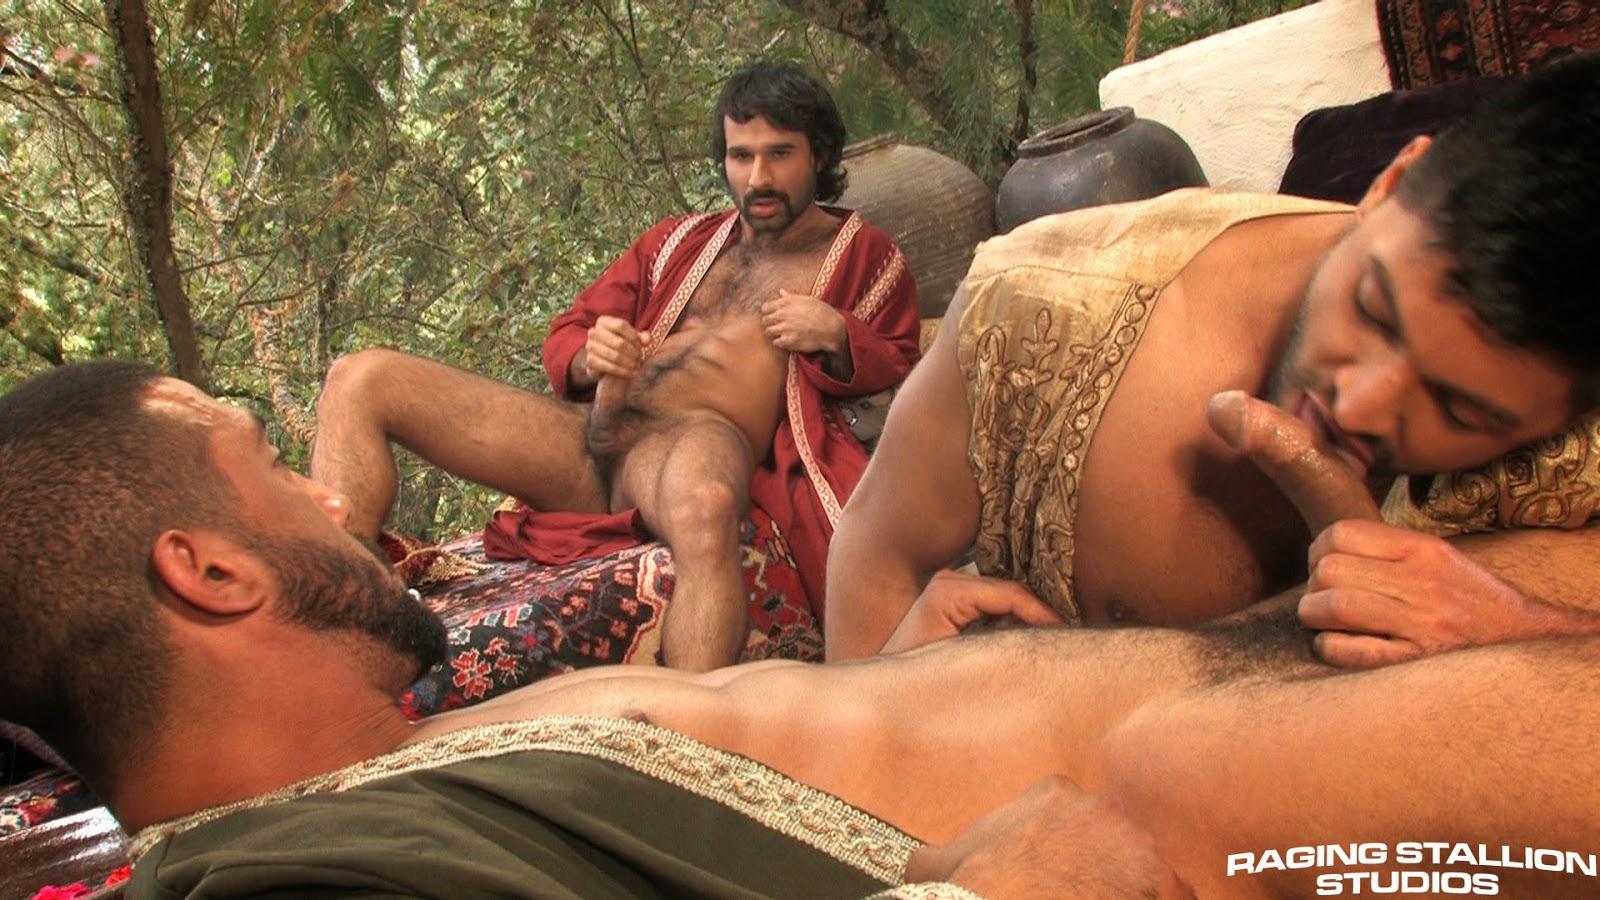 Arab gay sex guy school out frat piss 8